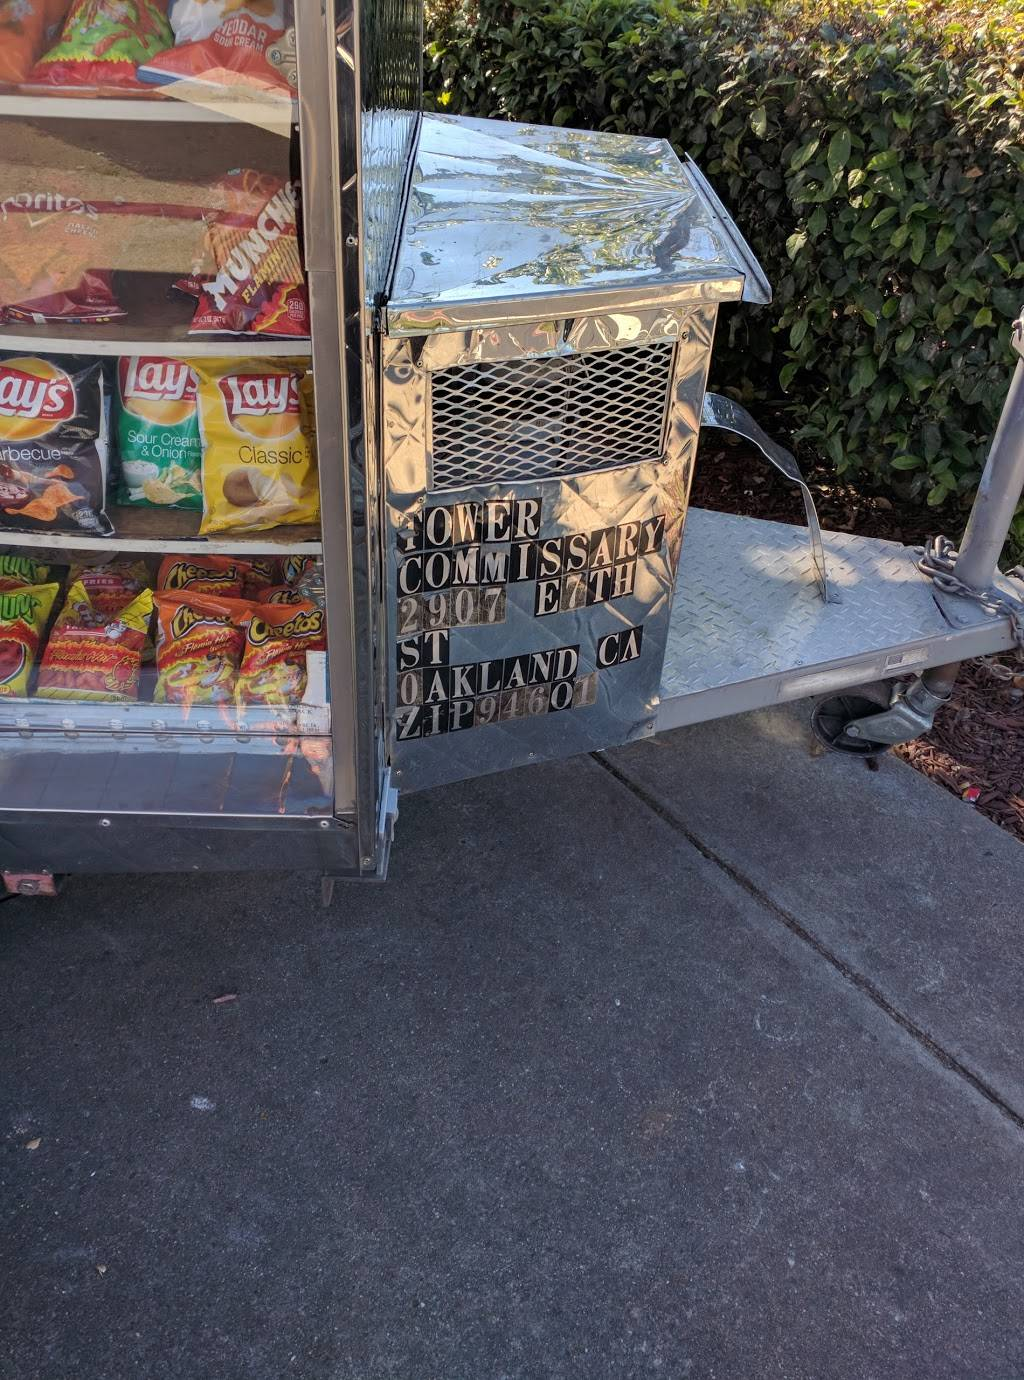 Ariana Hot Dog | restaurant | 4001-4029 Hollis St, Emeryville, CA 94608, USA